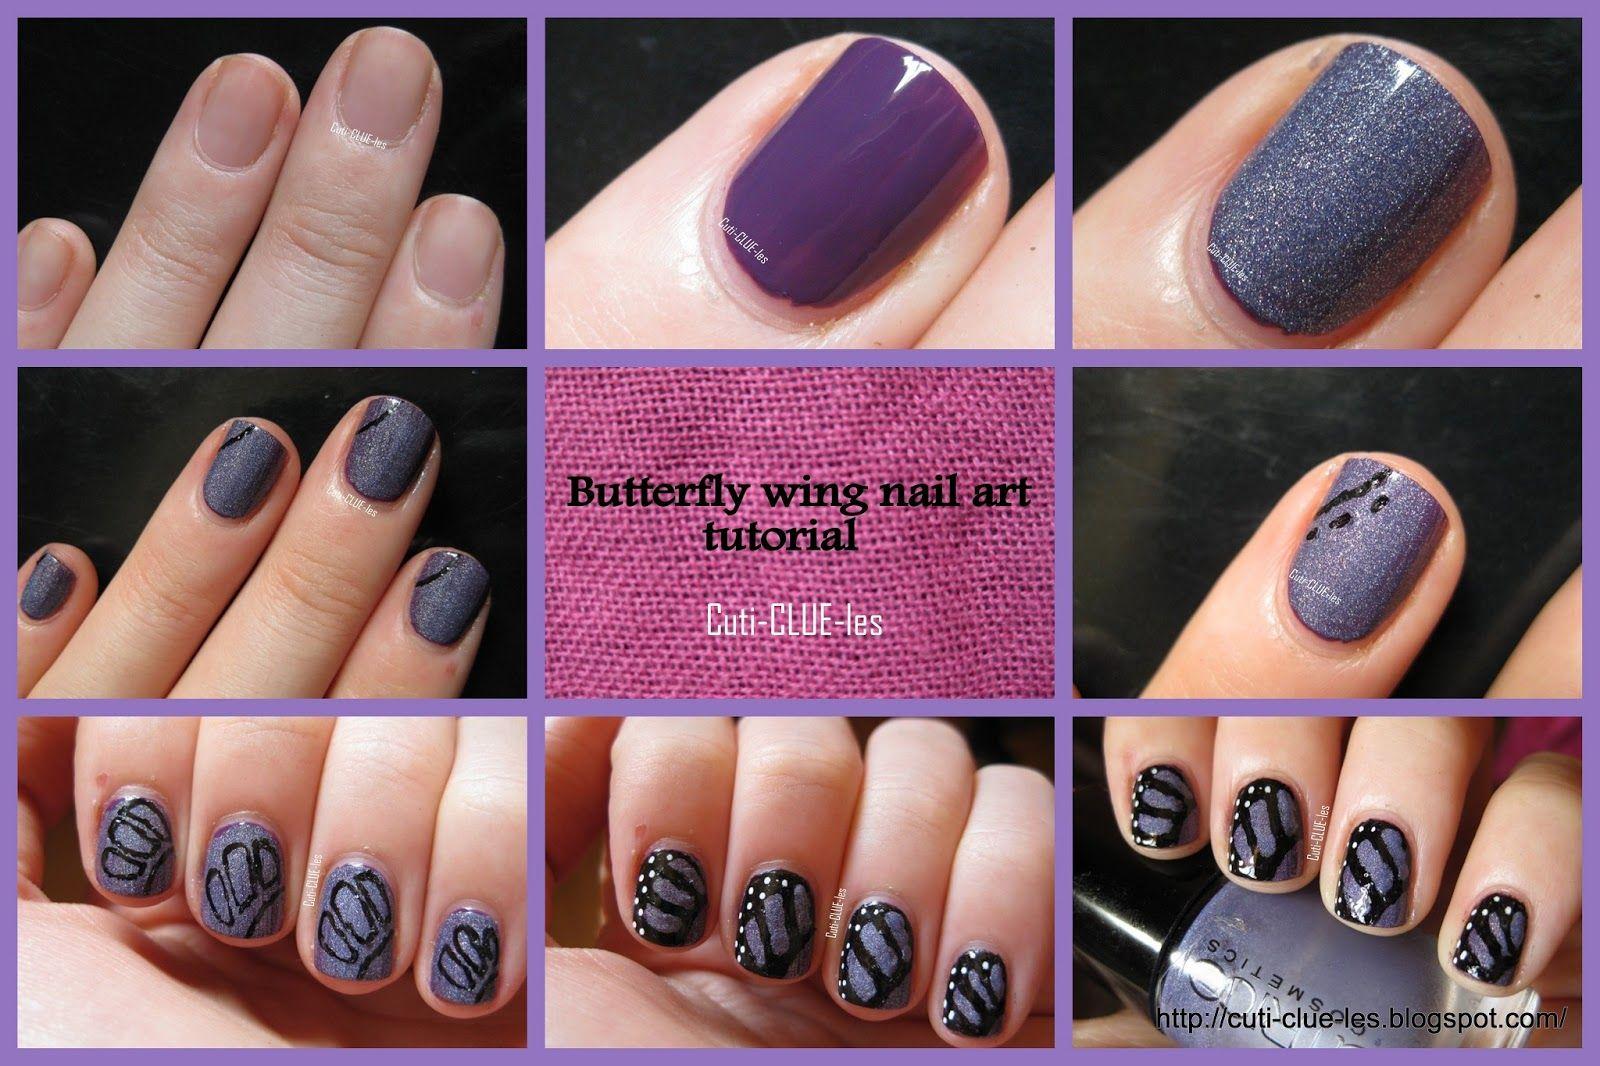 Cuti Clue Les Erfly Wing Nail Art Tutorial Nails